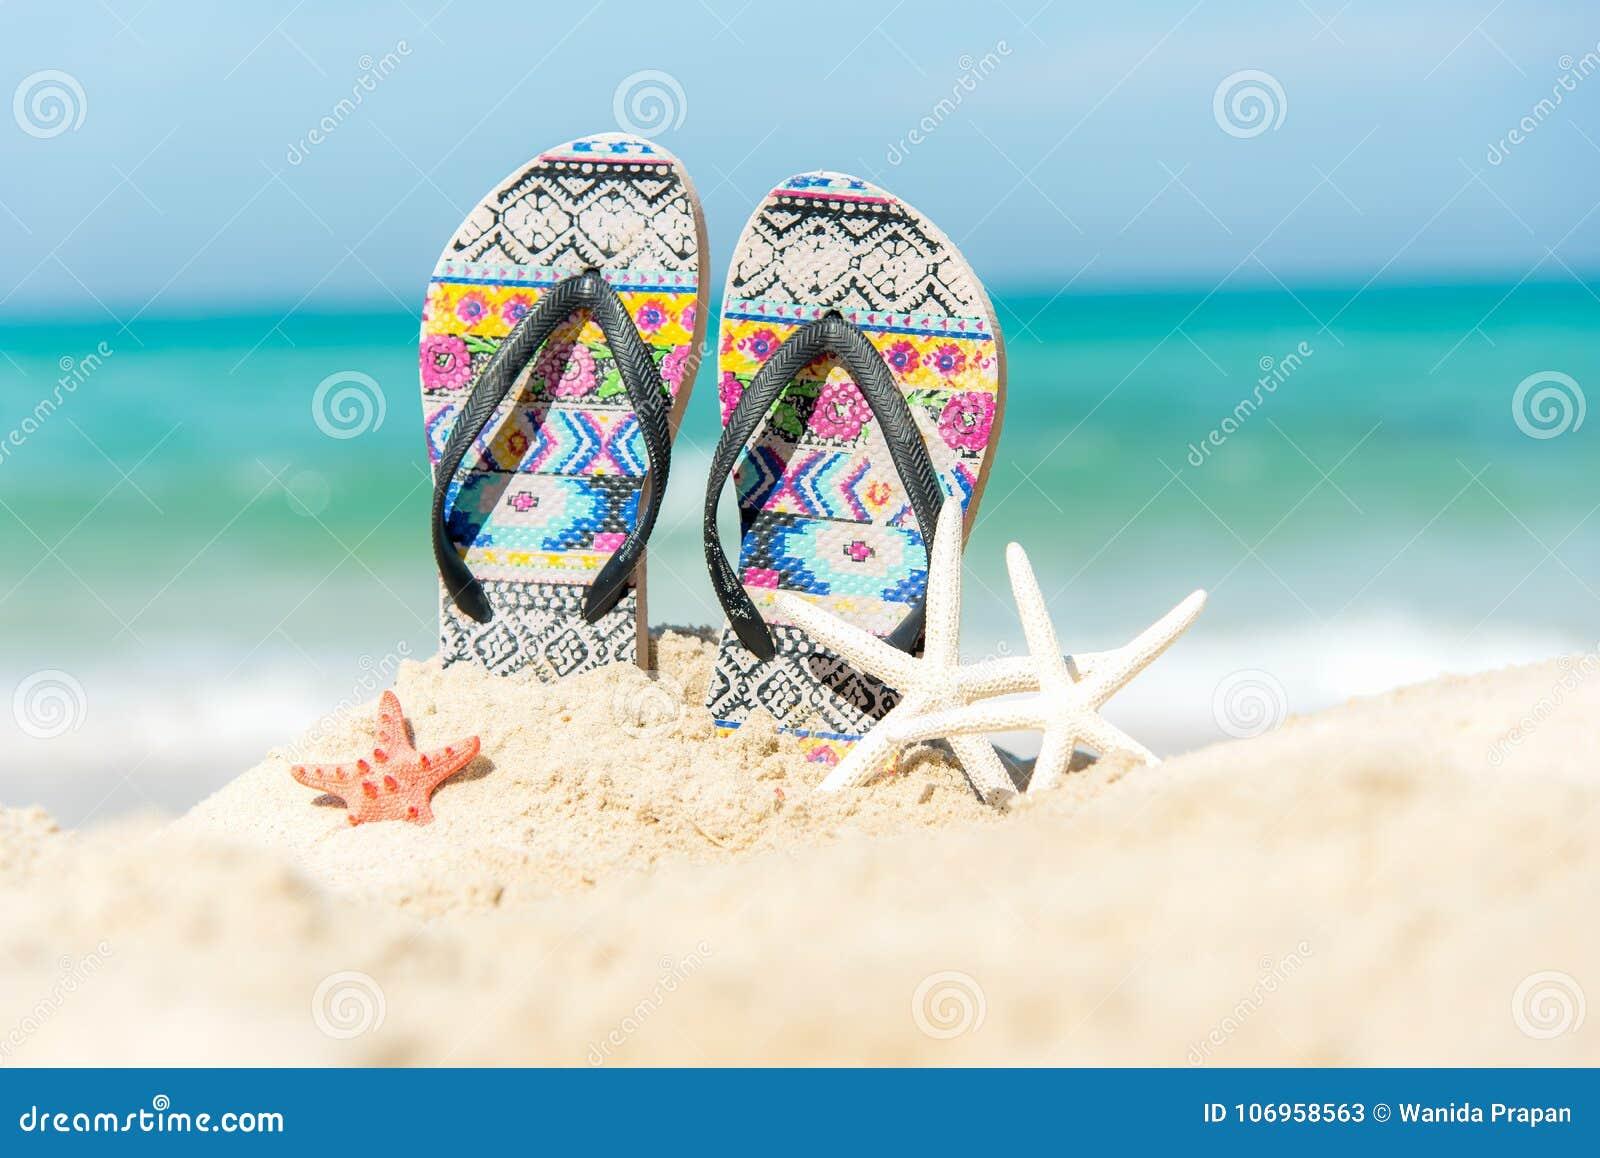 8046204191b7 Close Up Sandals On The Sand Beach With Starfish Sandy Beach. Stock ...